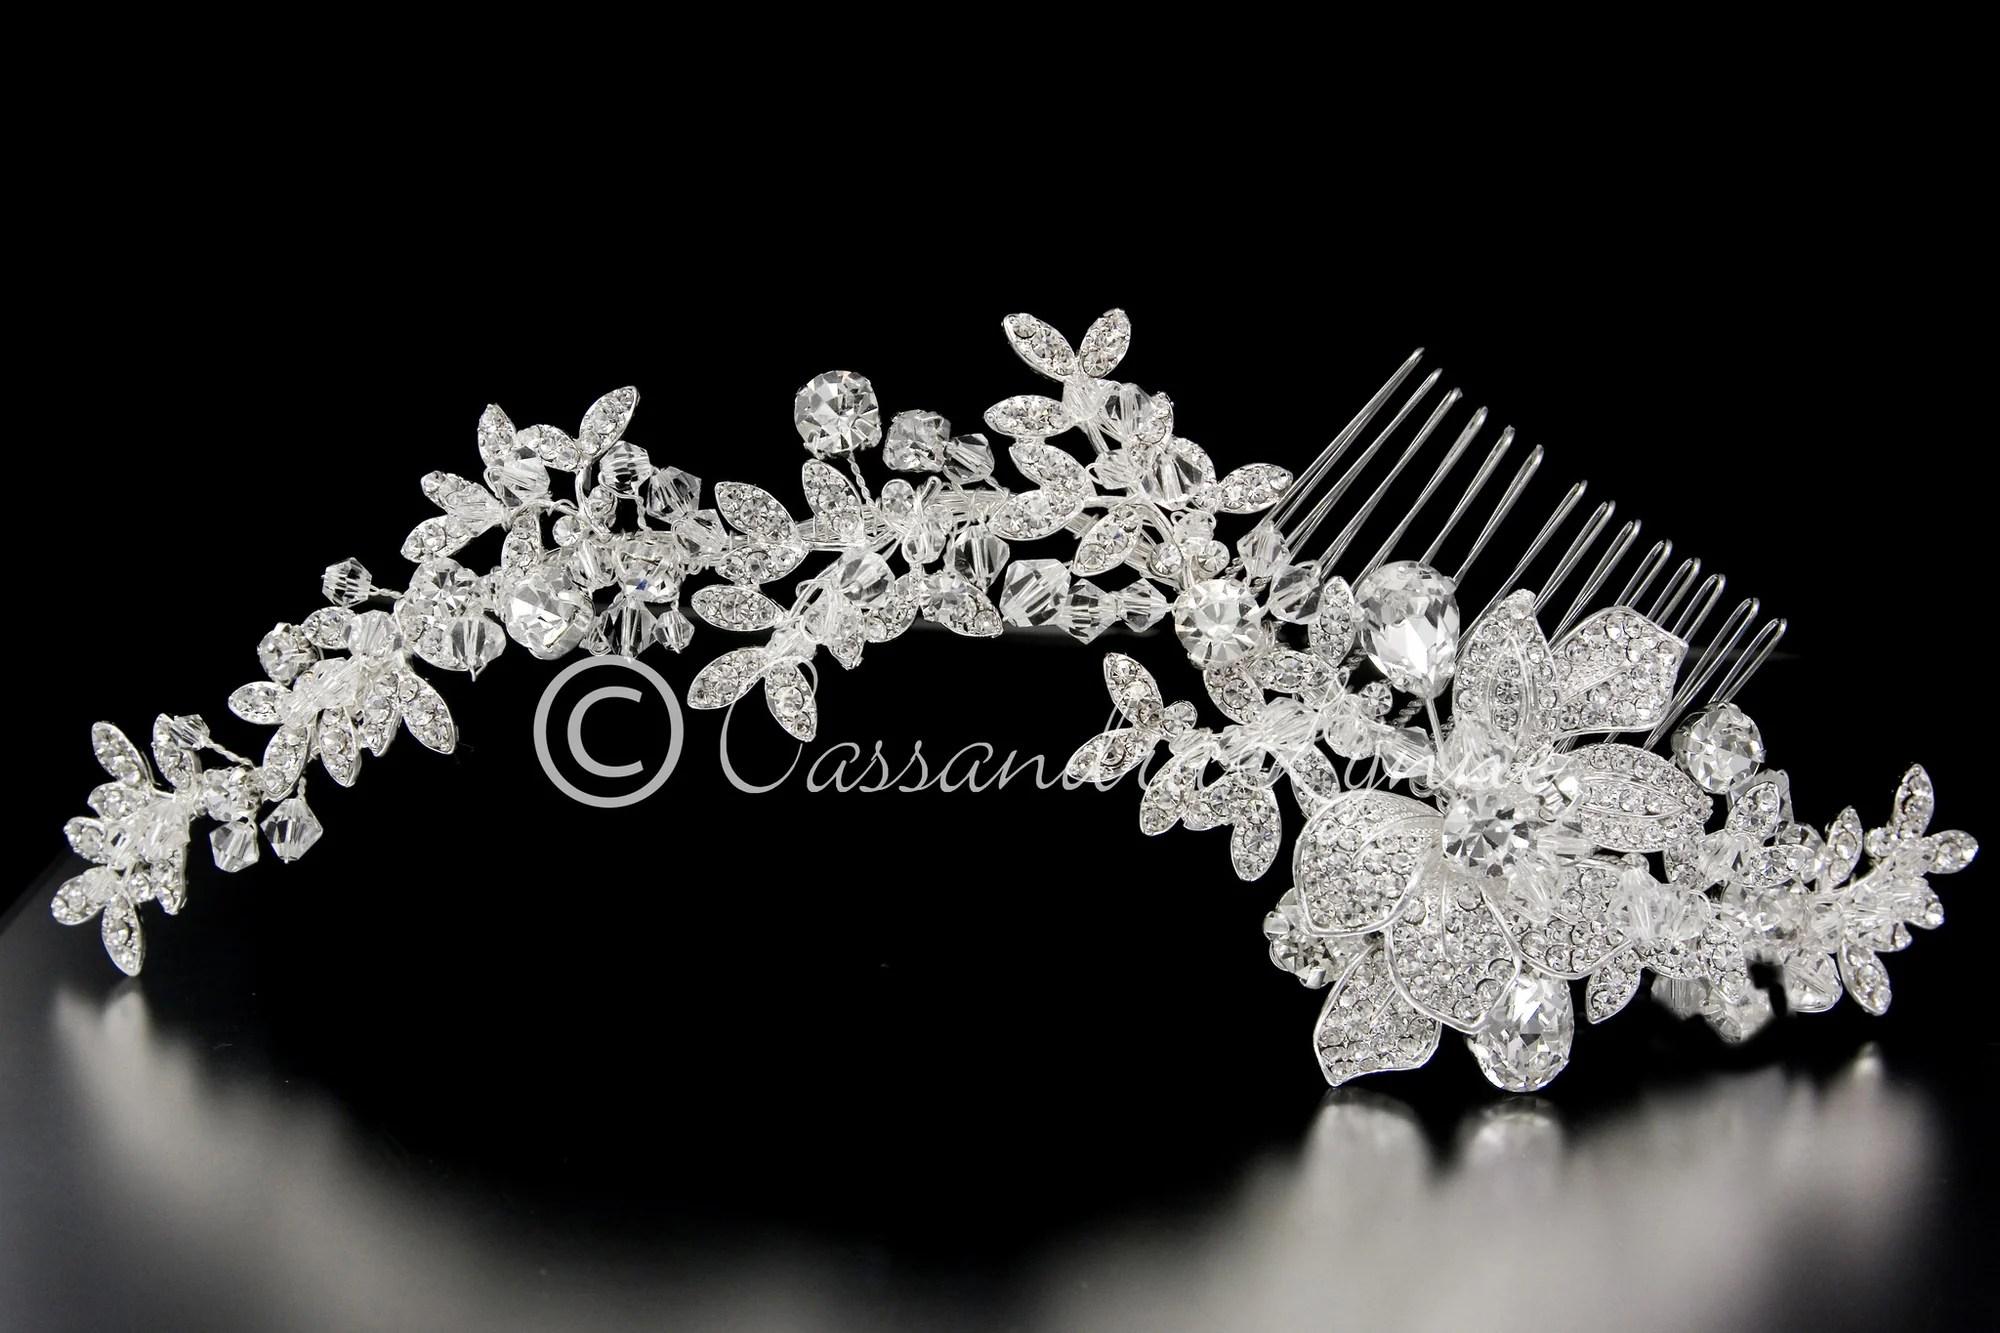 Crystal Bridal Hair Comb In A Rhinestone Vine Design